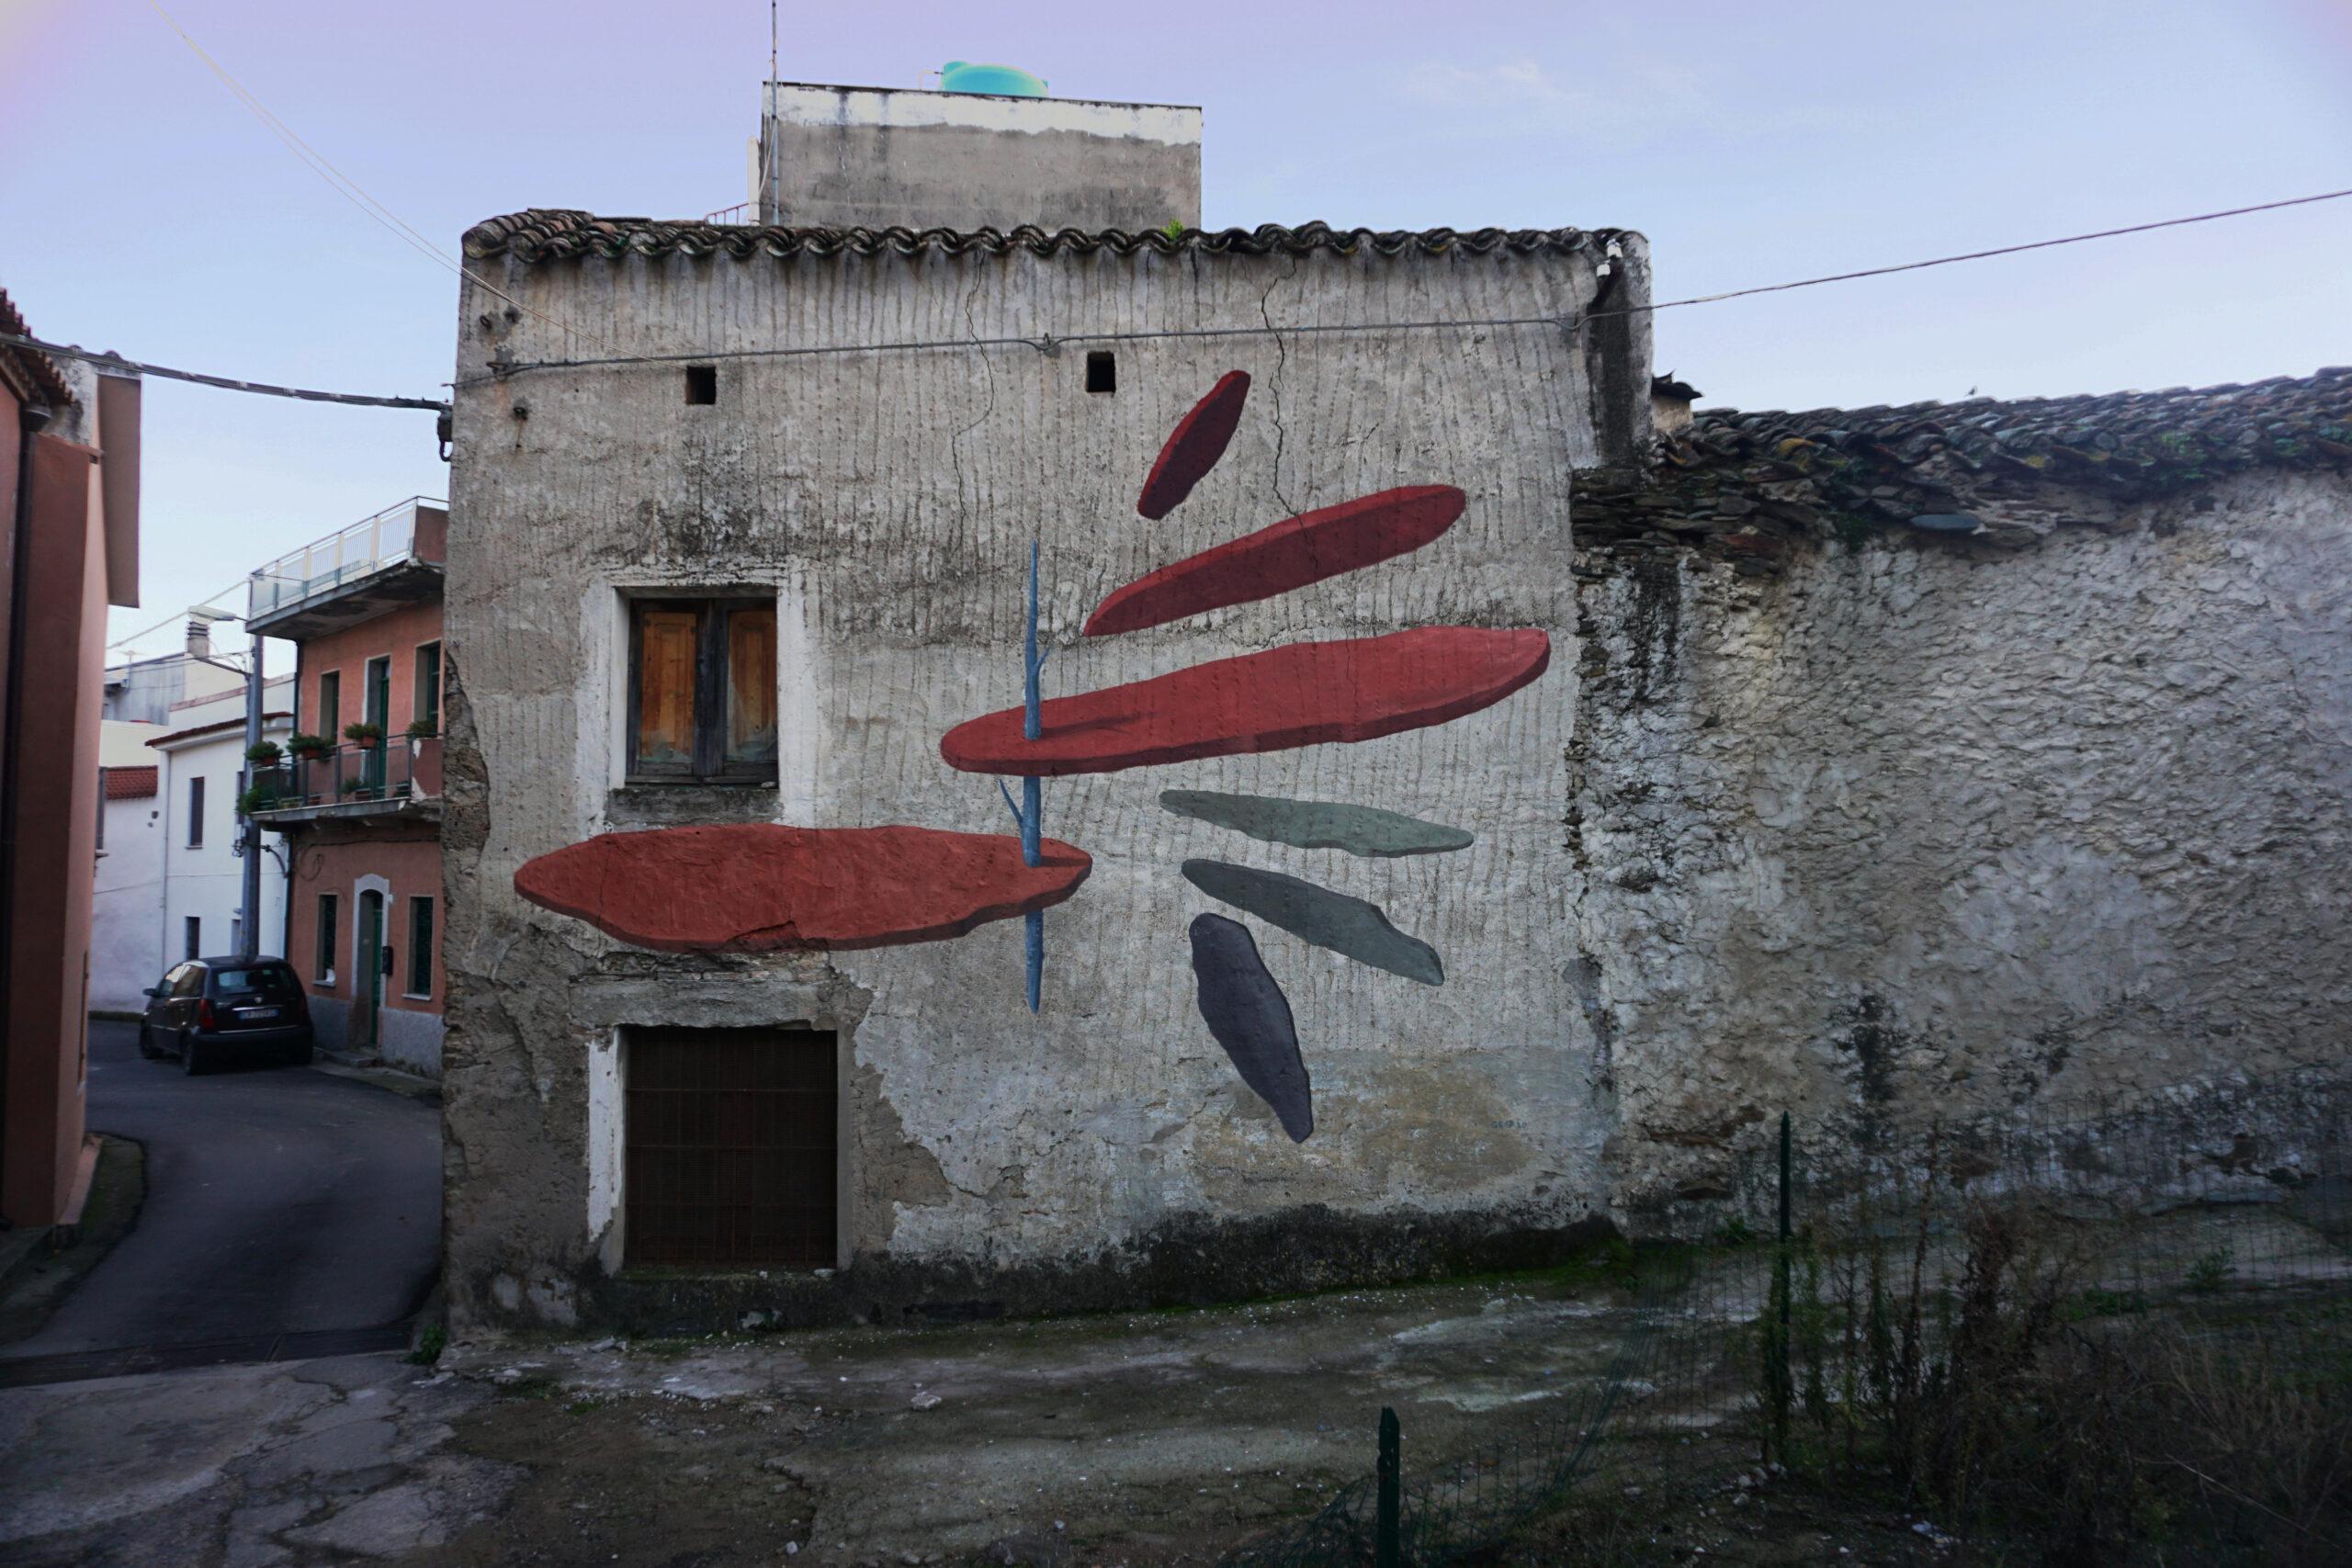 Daniele-Gregorini-Tertenia